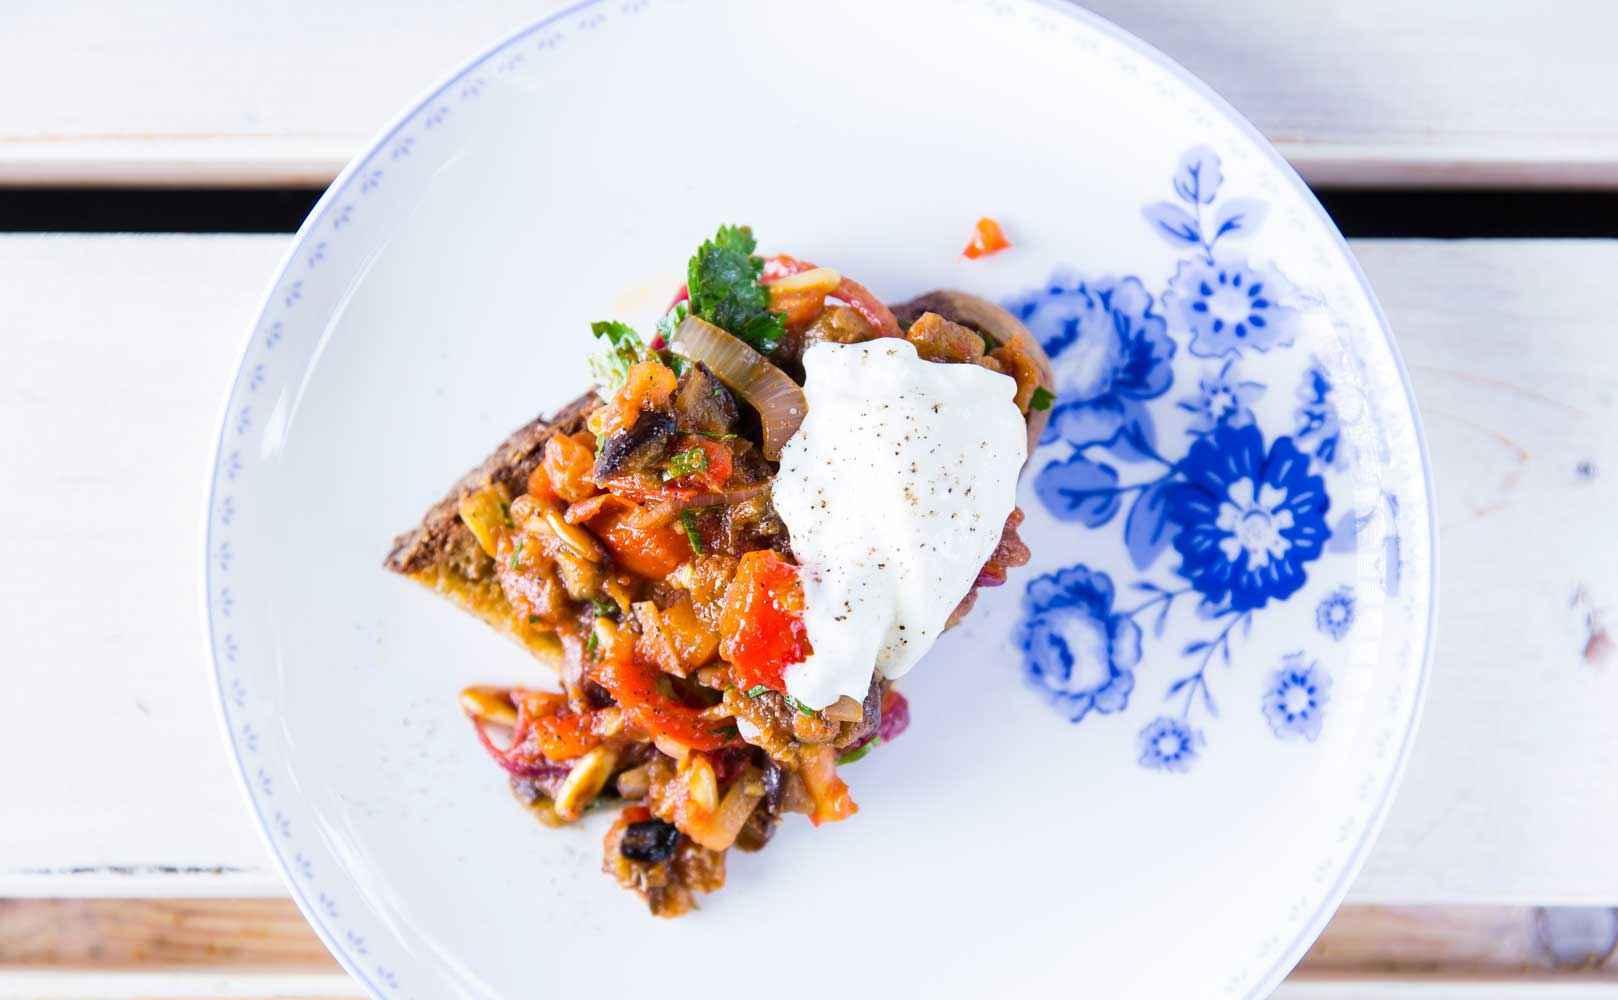 Rezept für Crostini mit Caponata à la Provence